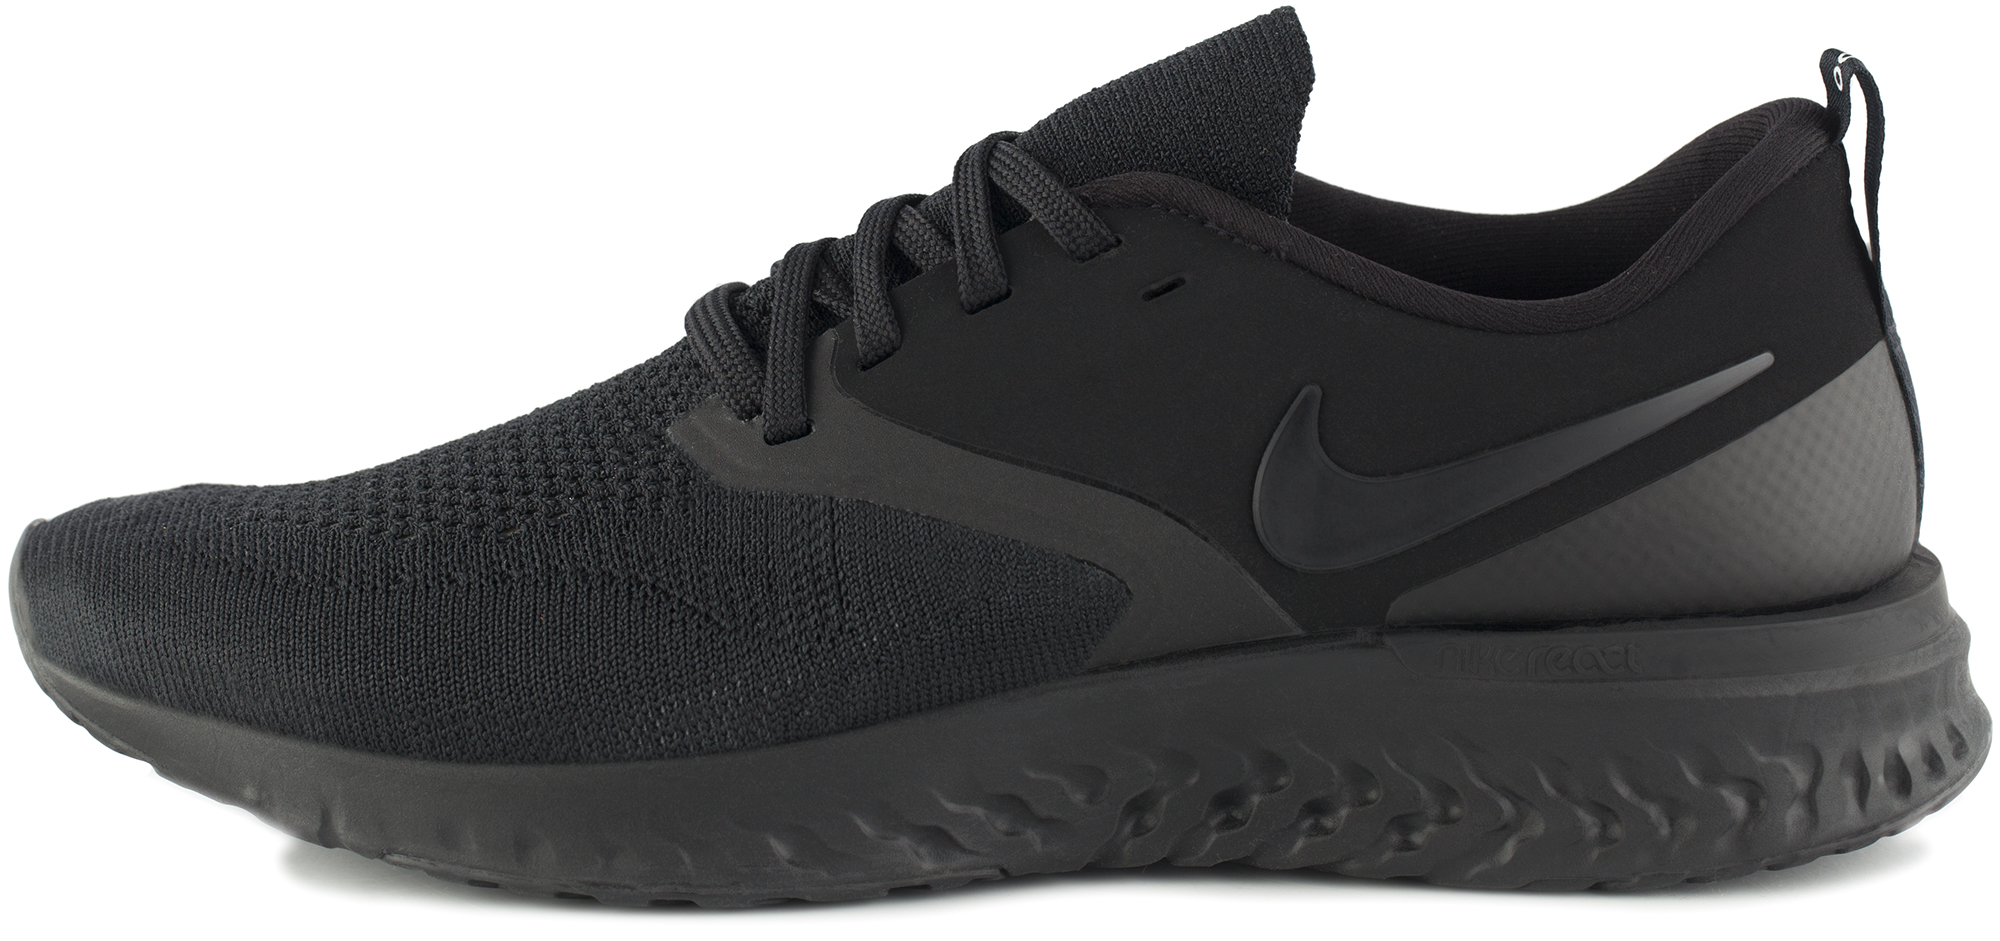 Nike Кроссовки женские Nike Odyssey React 2 Flyknit, размер 40